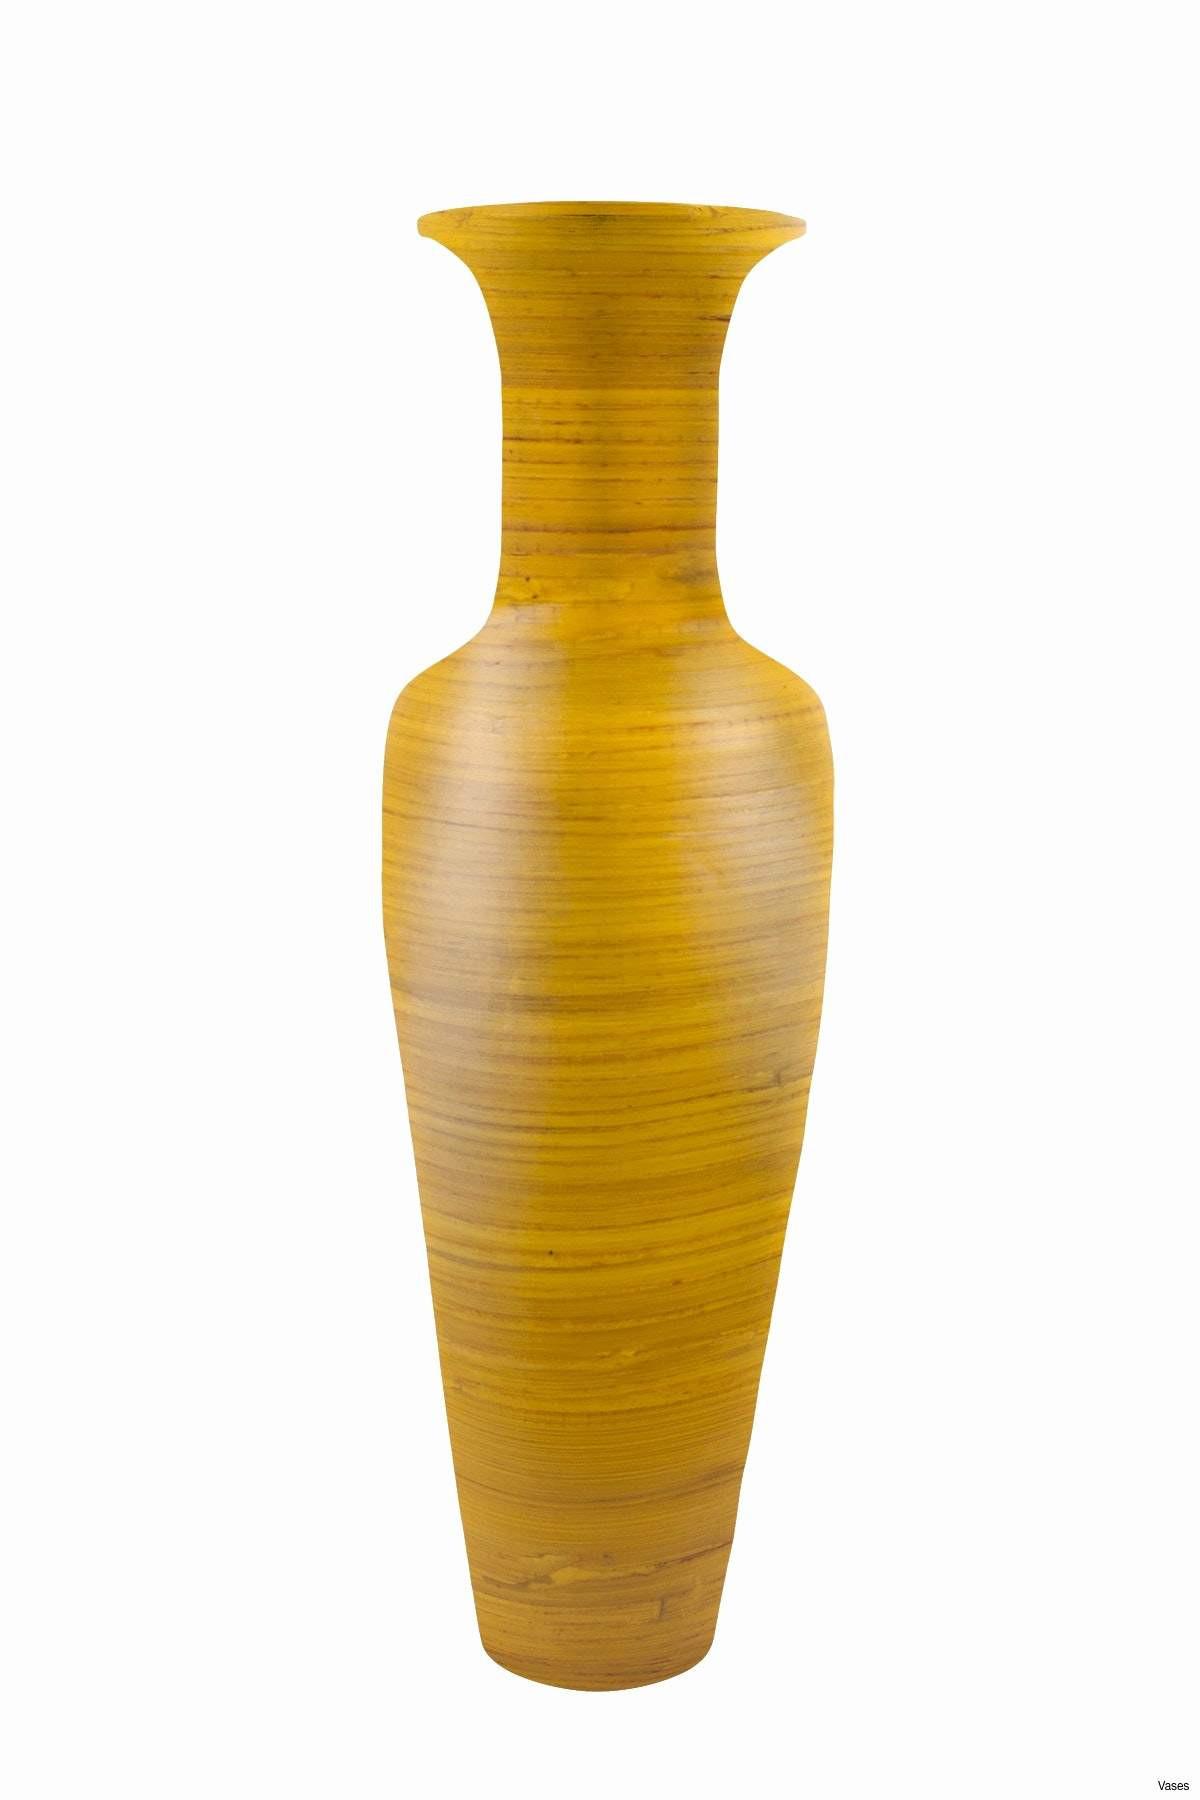 mccoy pottery green vase of vases set of 3 images area floor rugs new joaquin gray vases set 3 with area floor rugs new joaquin gray vases set 3 2h pottery floor i 0d